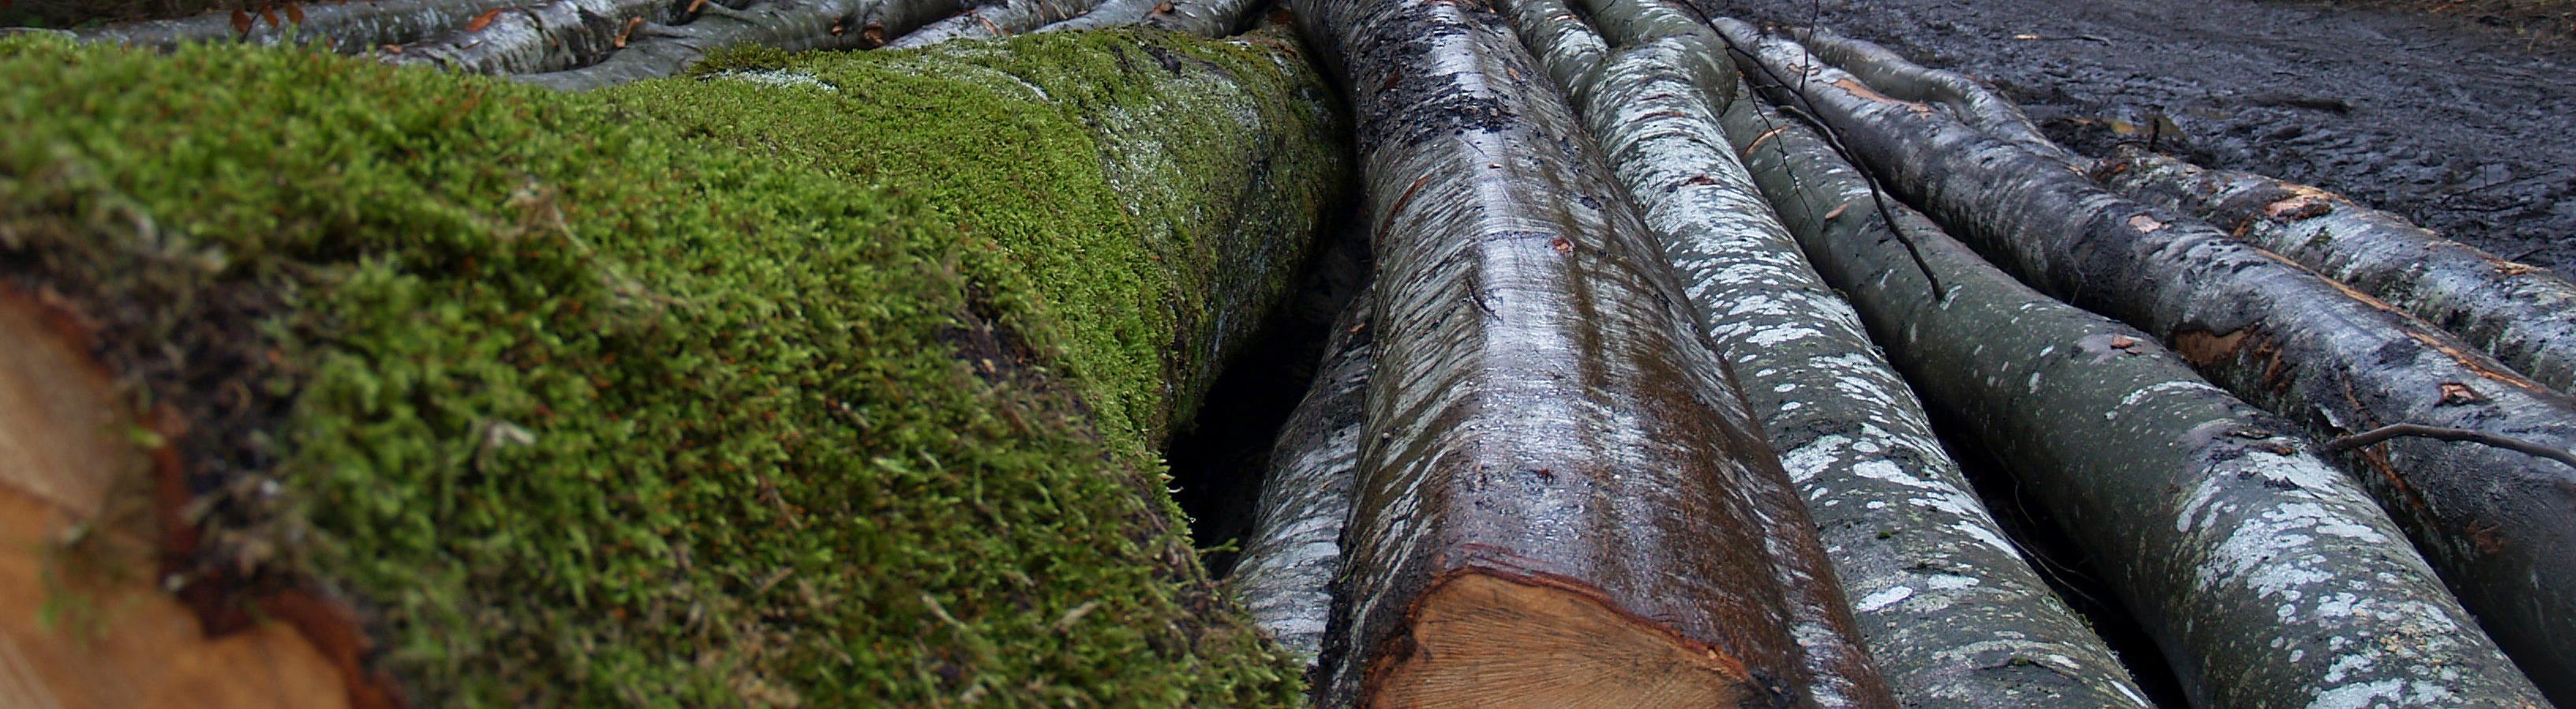 Logged trees in the Gurghiu Mountains, Eastern Carpathians, Romania.